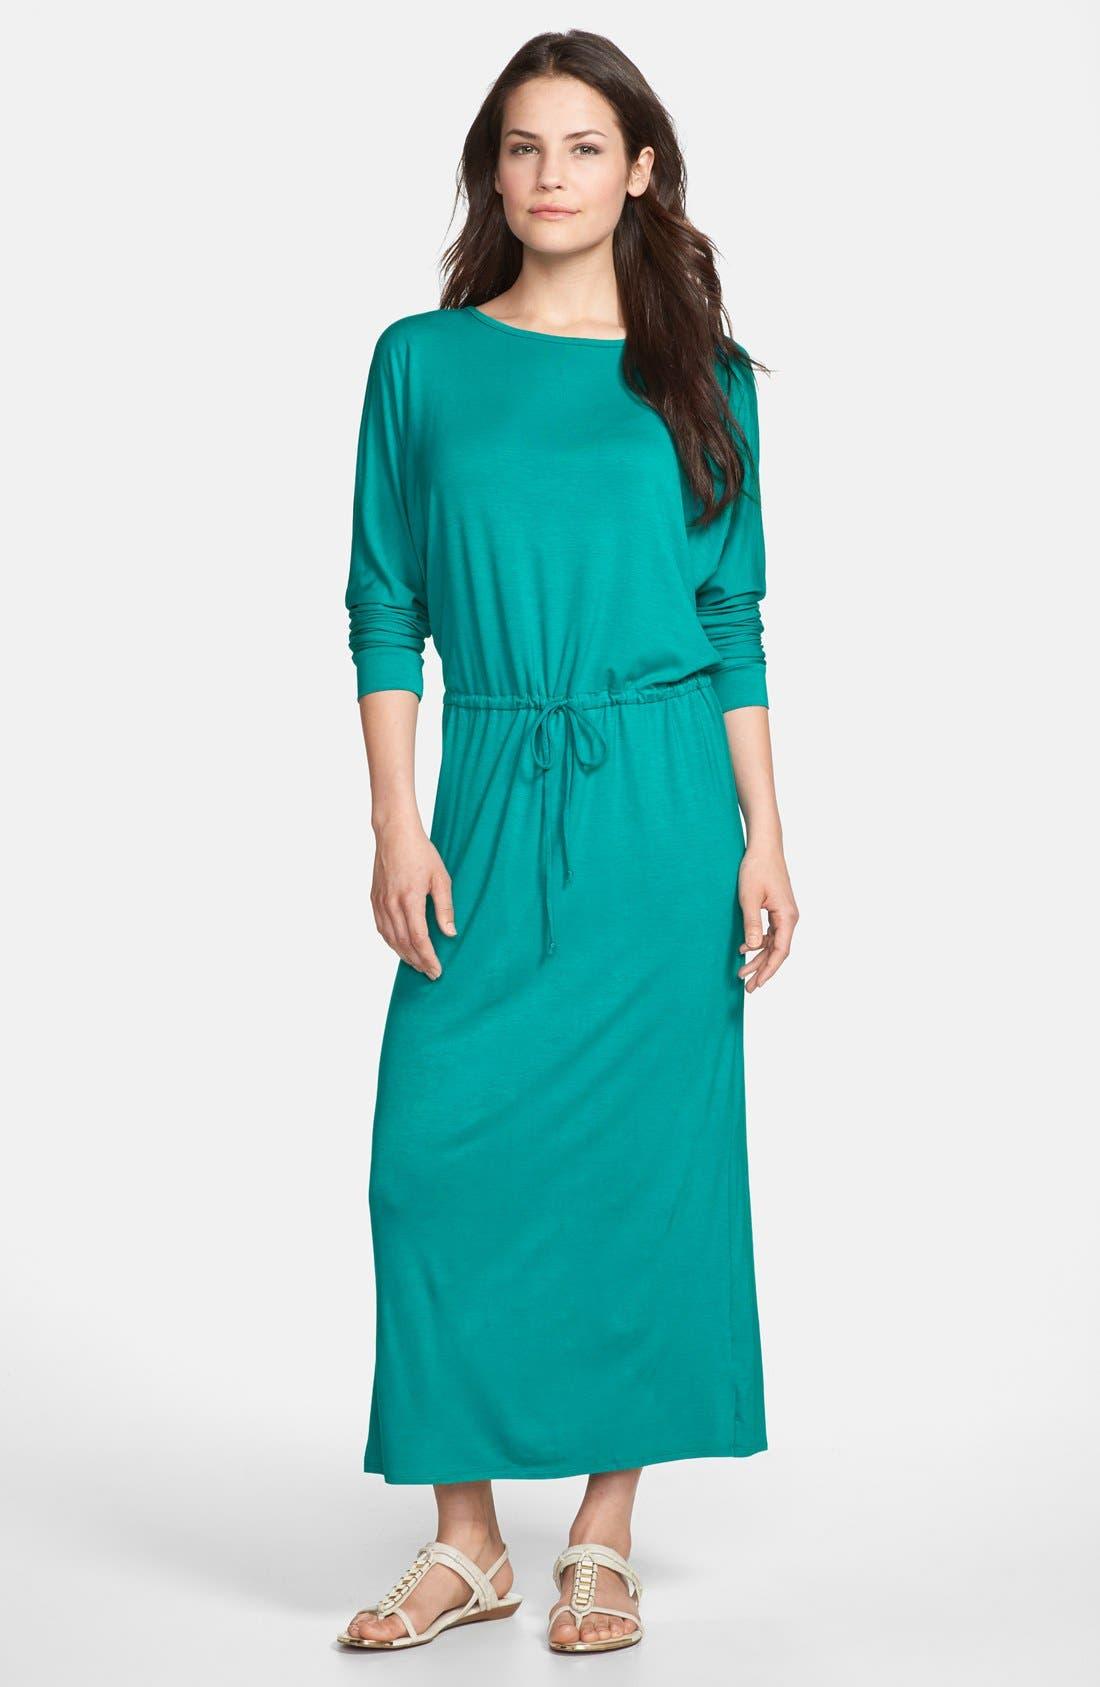 Alternate Image 1 Selected - Loveappella Tie Waist Maxi Dress